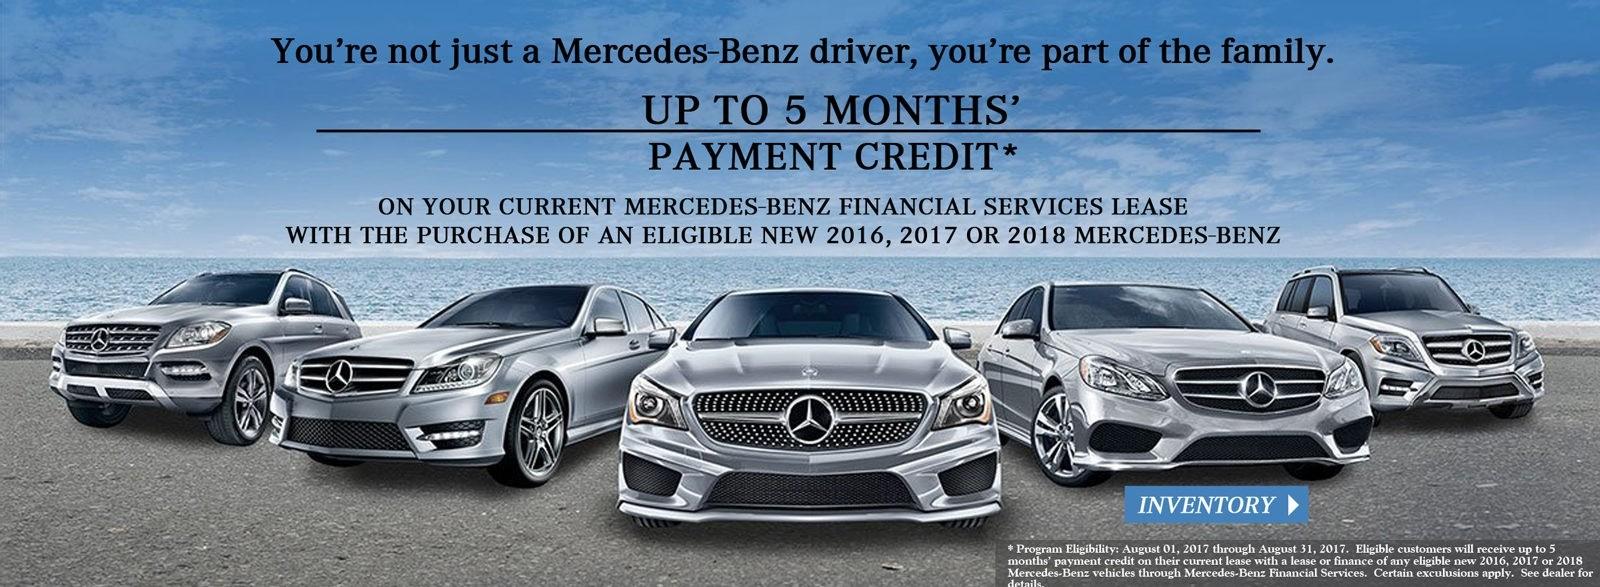 Mercedes-Benz Dealer in Northbrook, IL   Autohaus on Edens